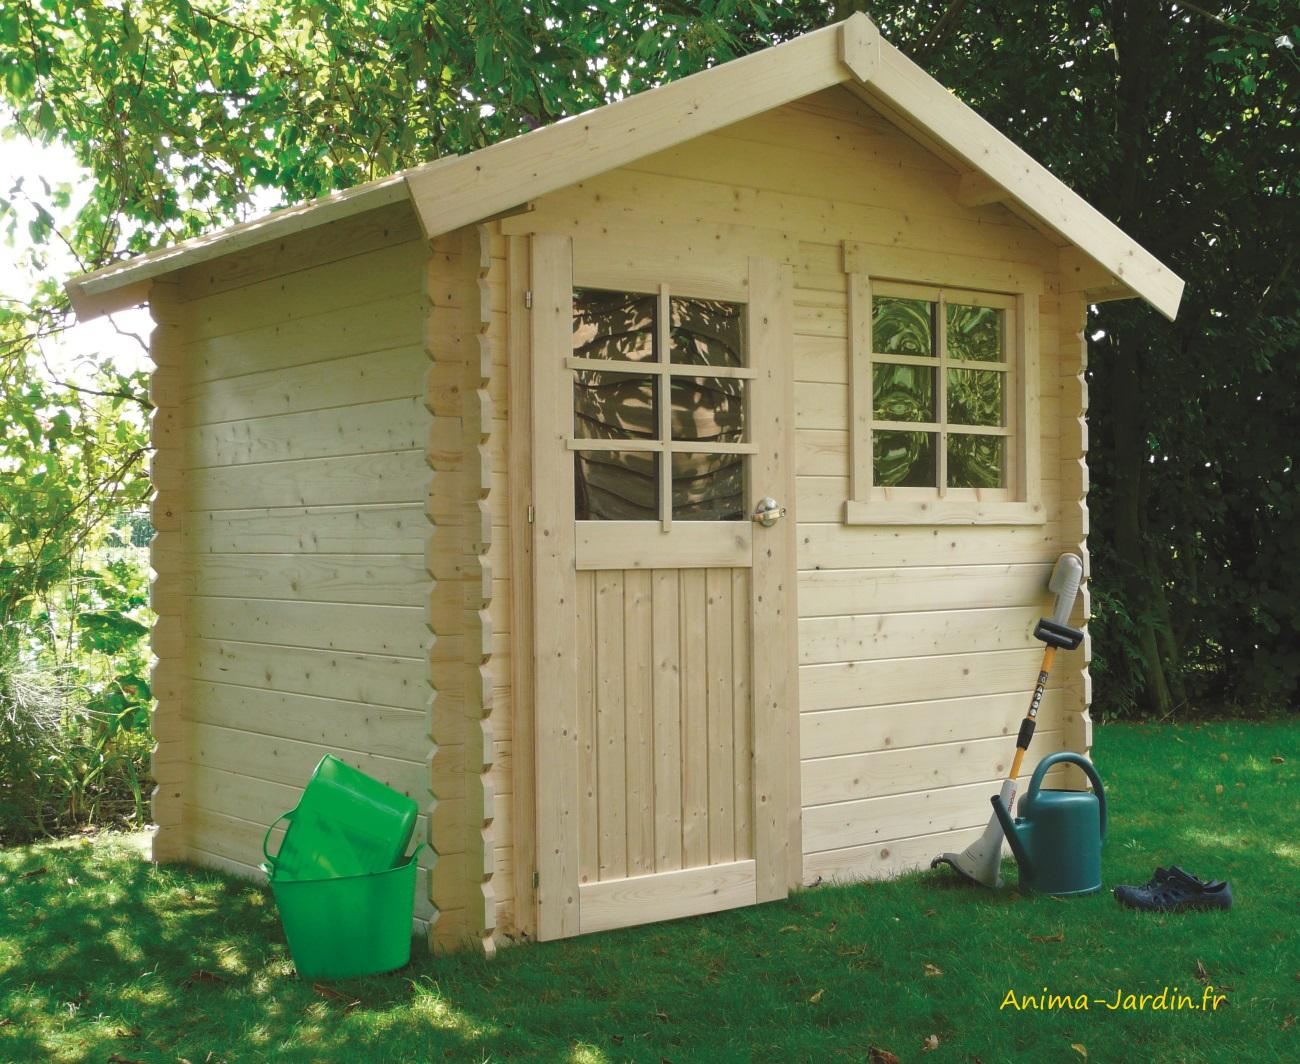 Abri-bois-jardin-extérieur-Saran-chalet-petite cabane-anima-jardin.fr